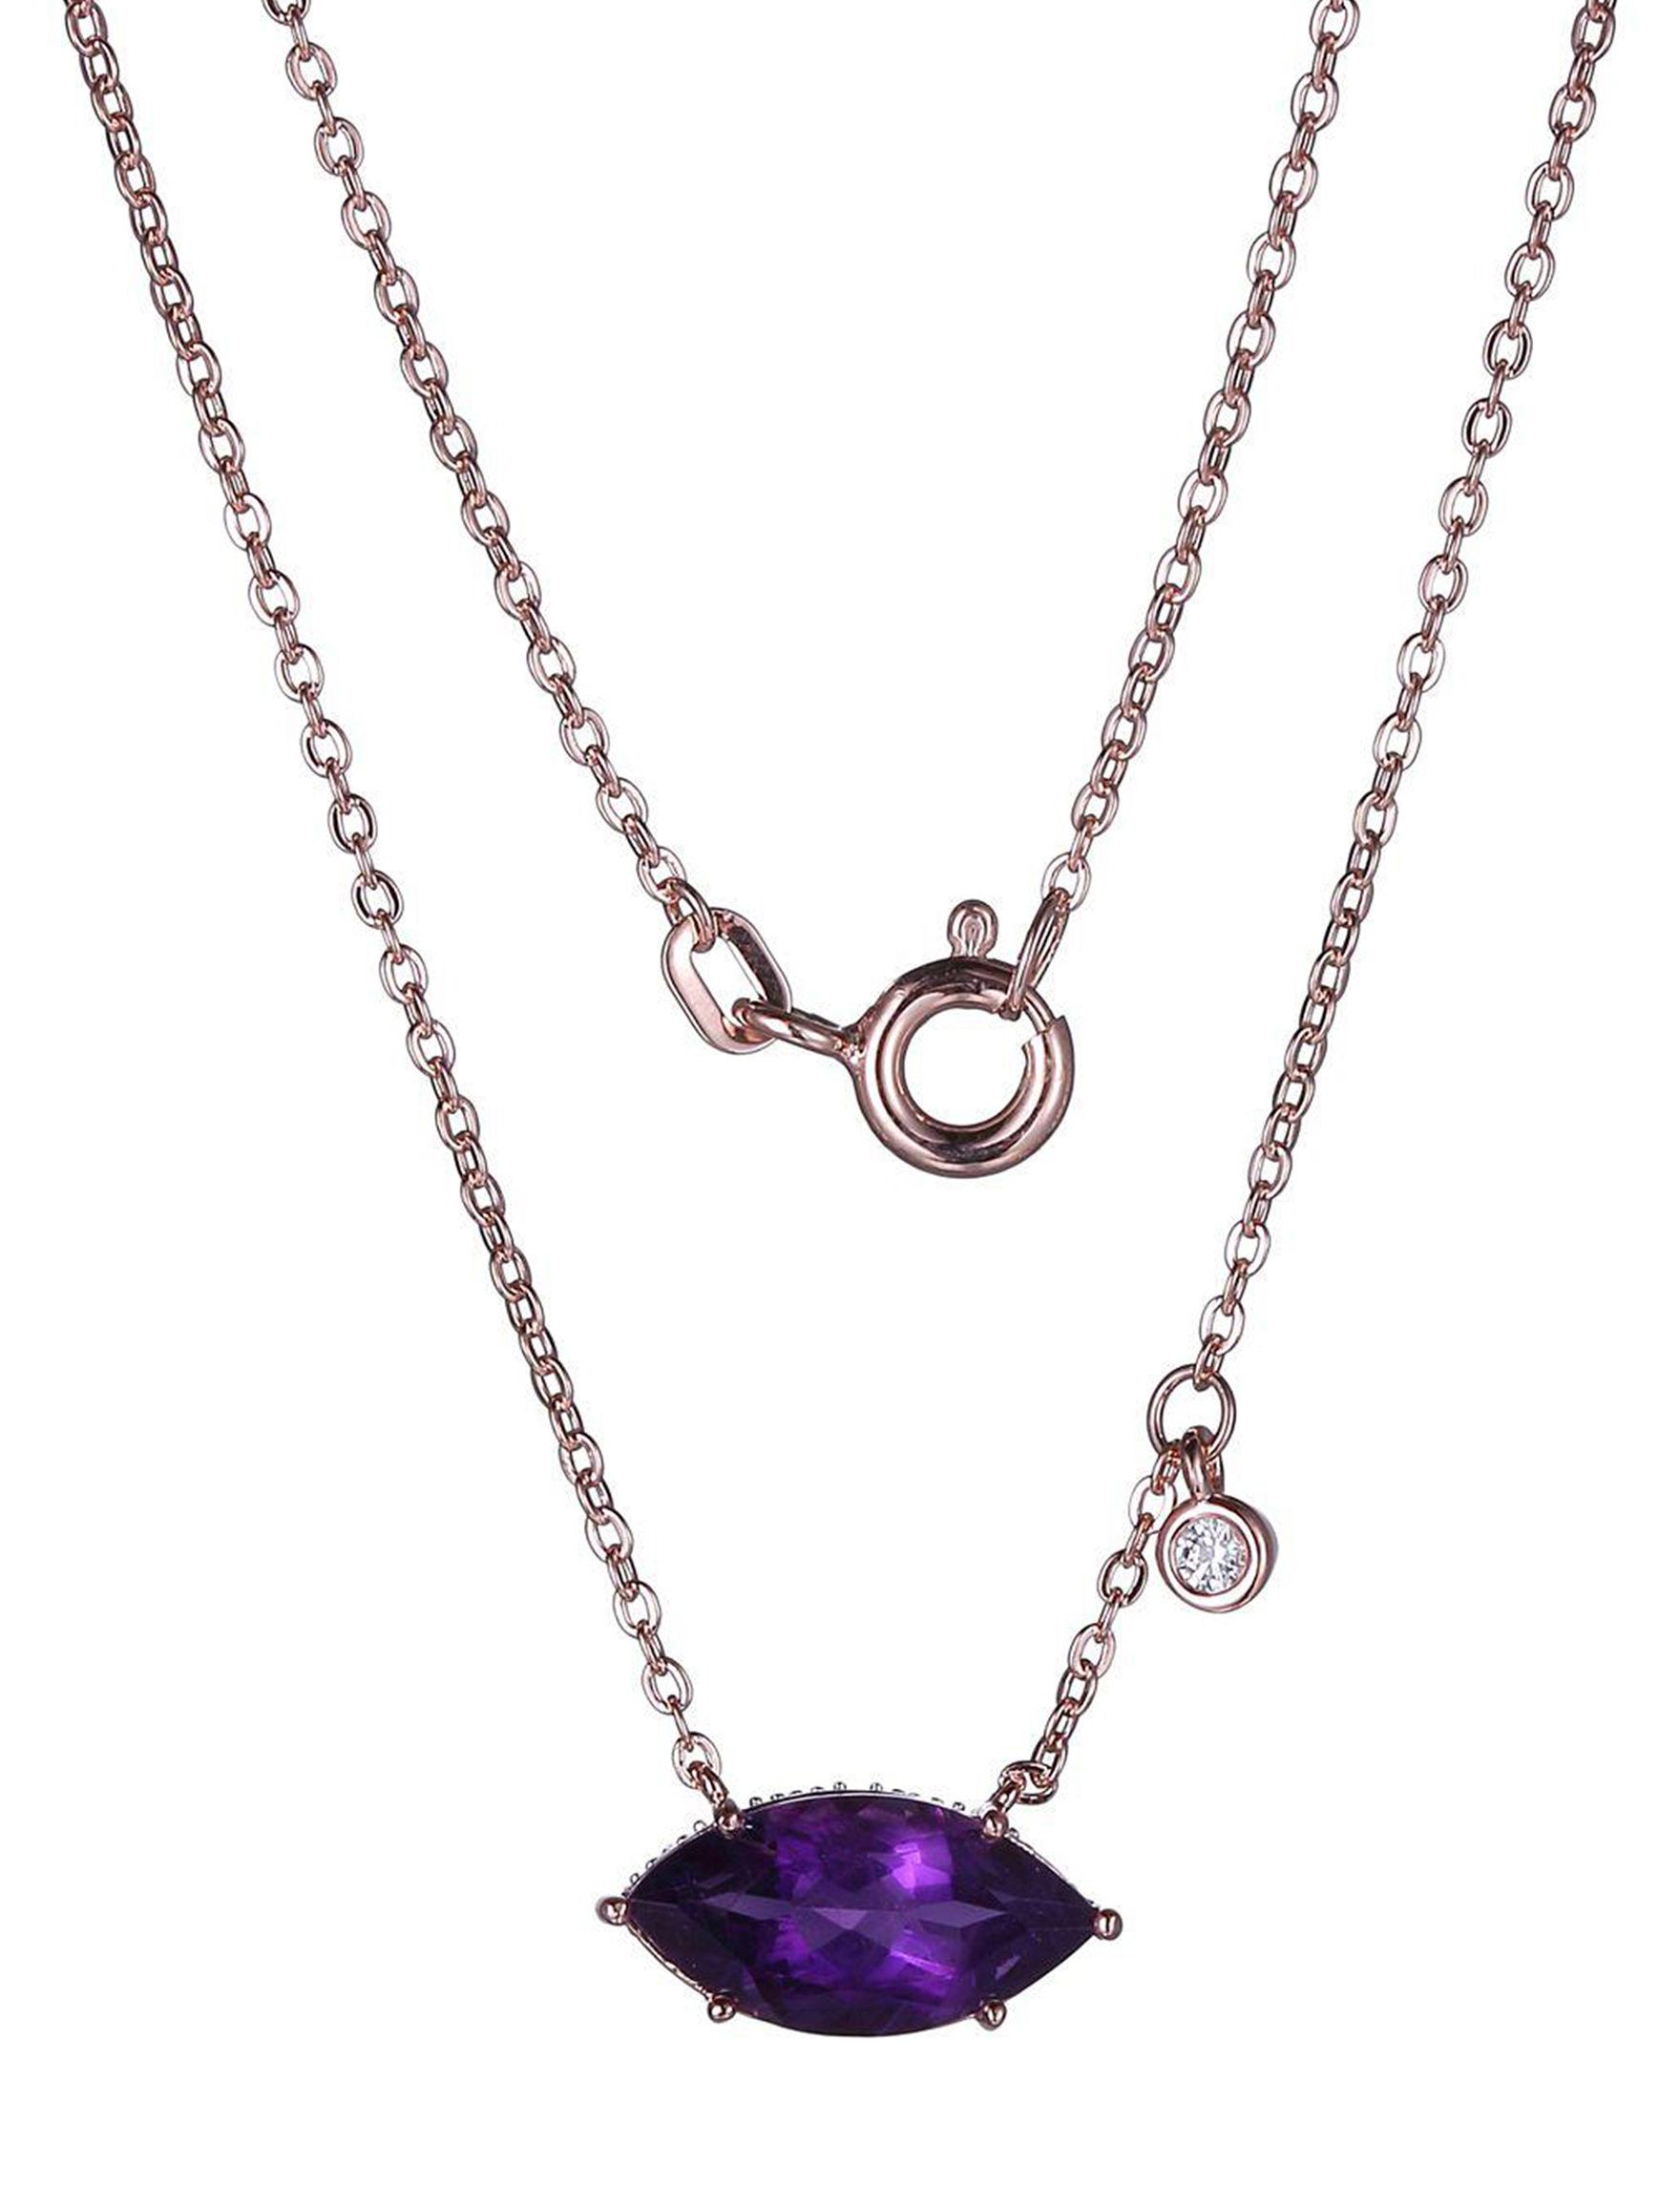 PAJ INC. Amethyst Necklaces & Pendants Fine Jewelry